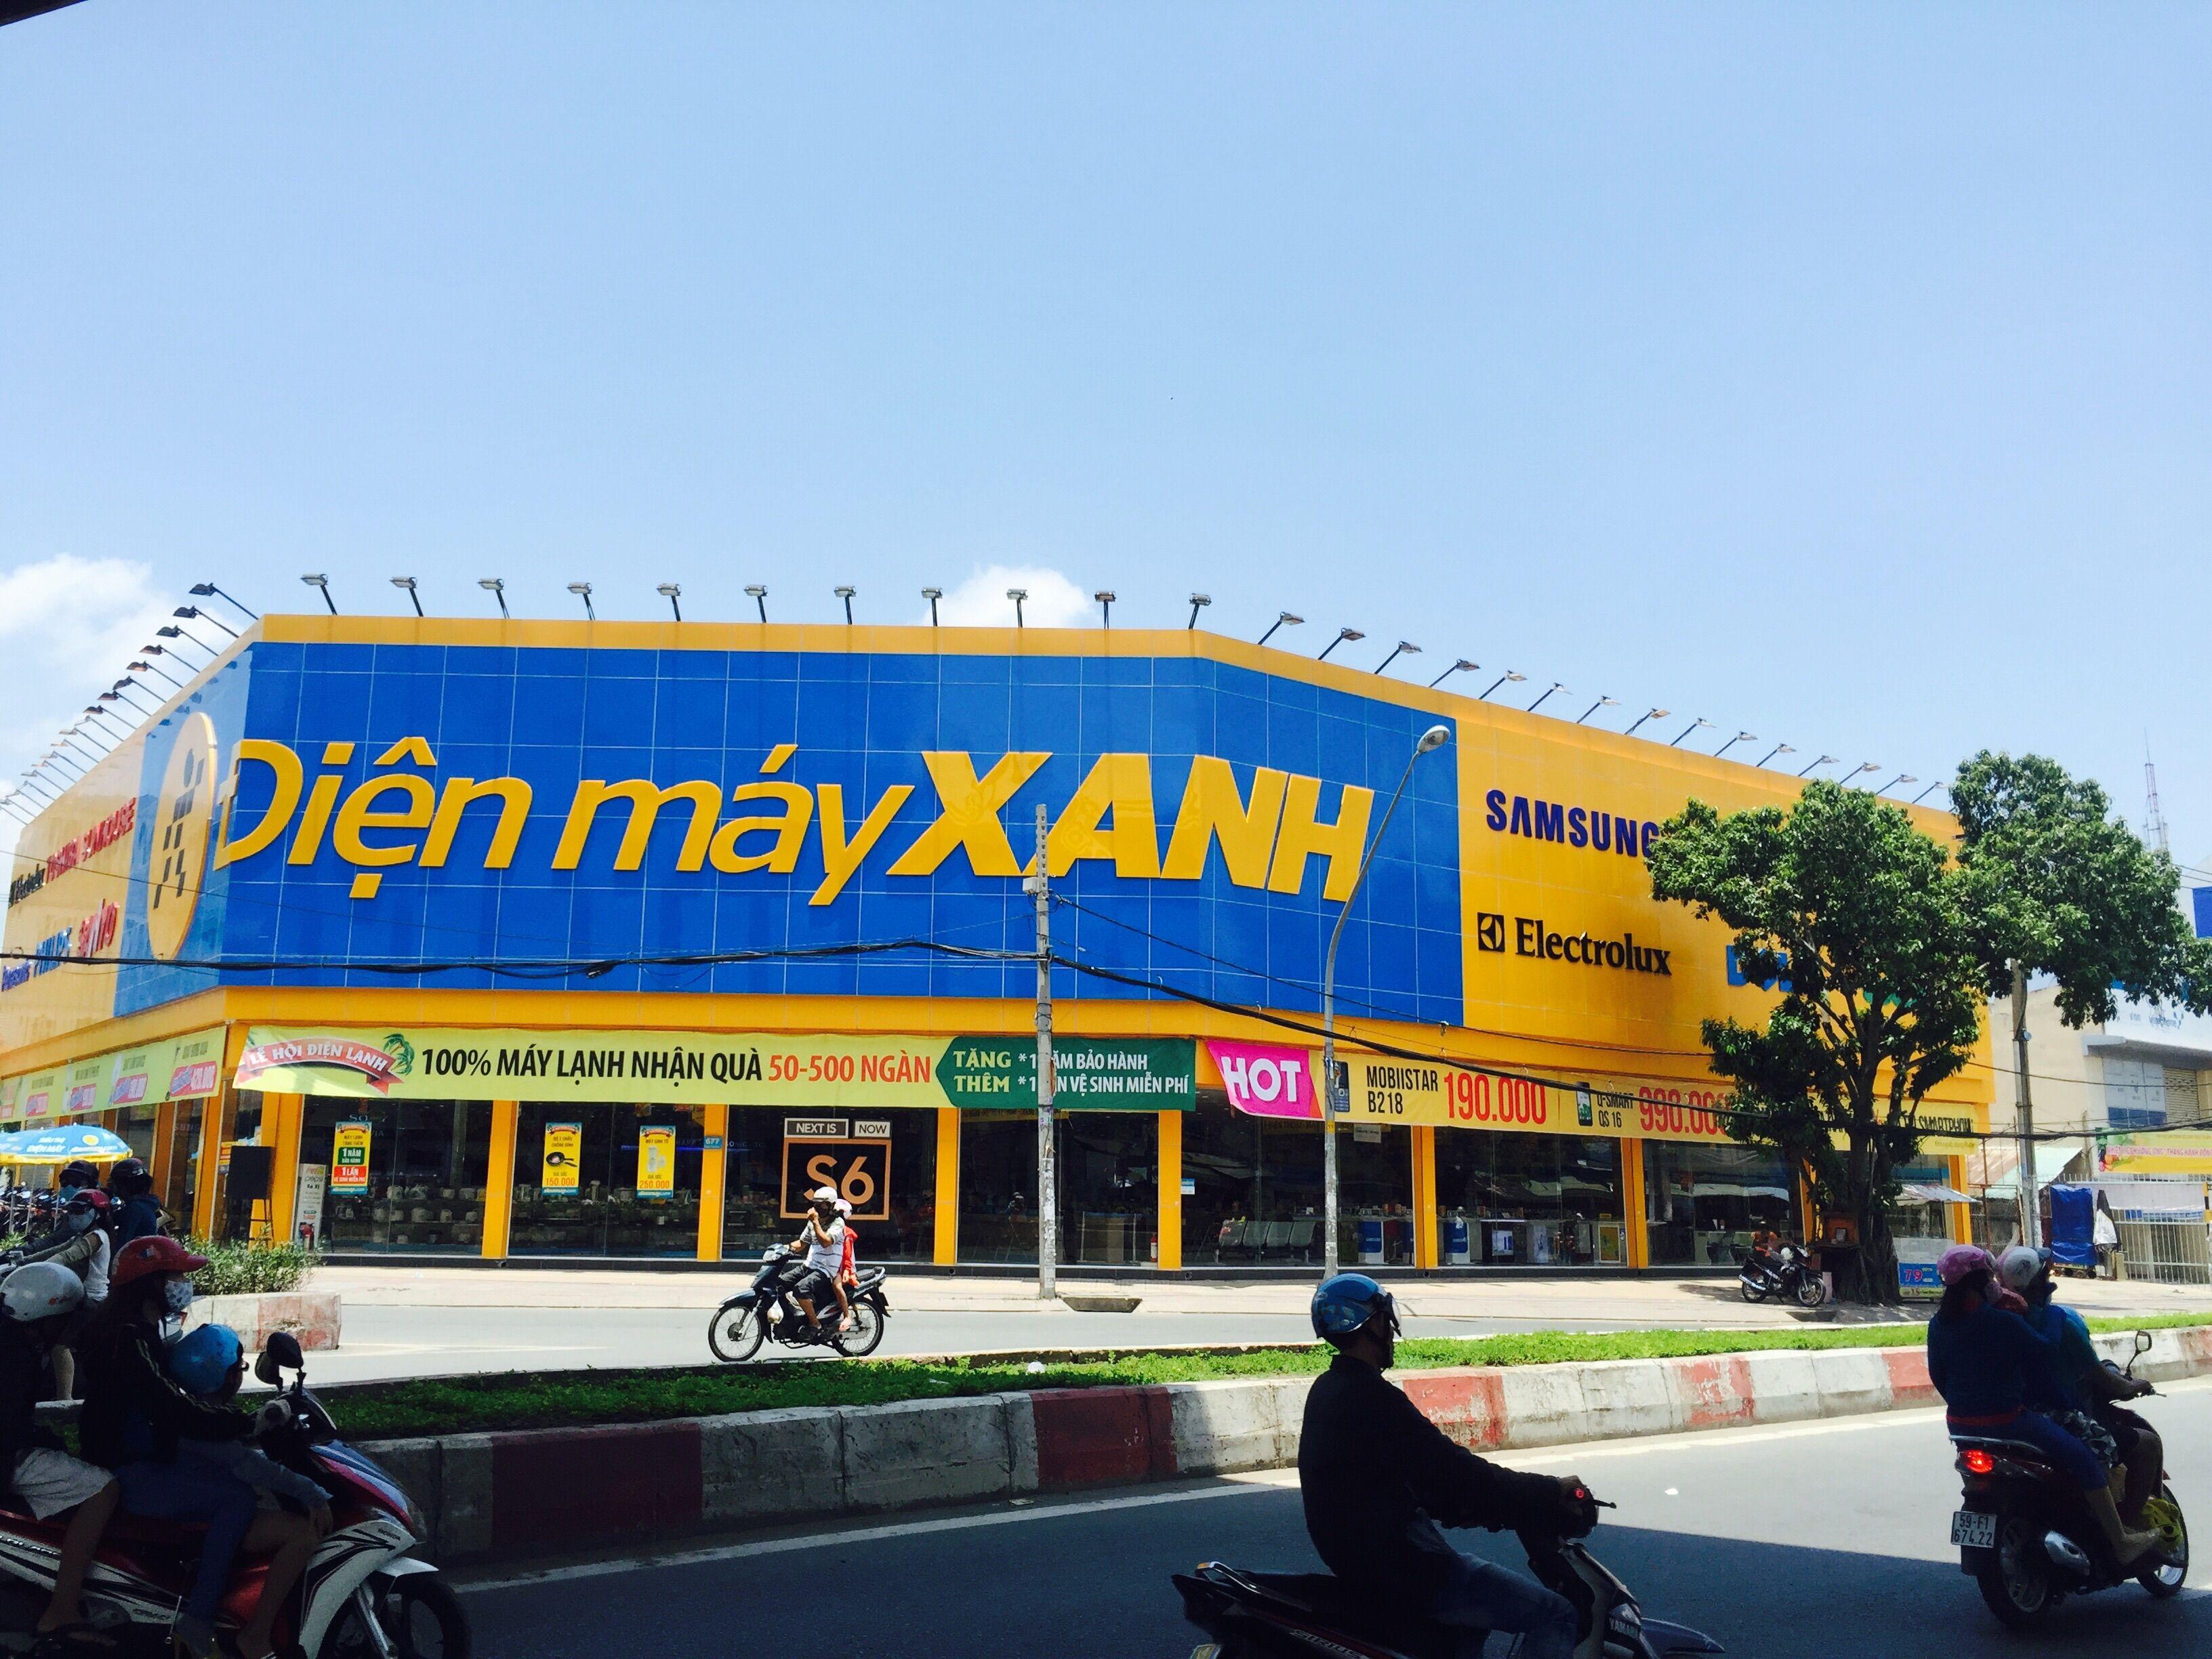 dienmayxanh huynh tan phat